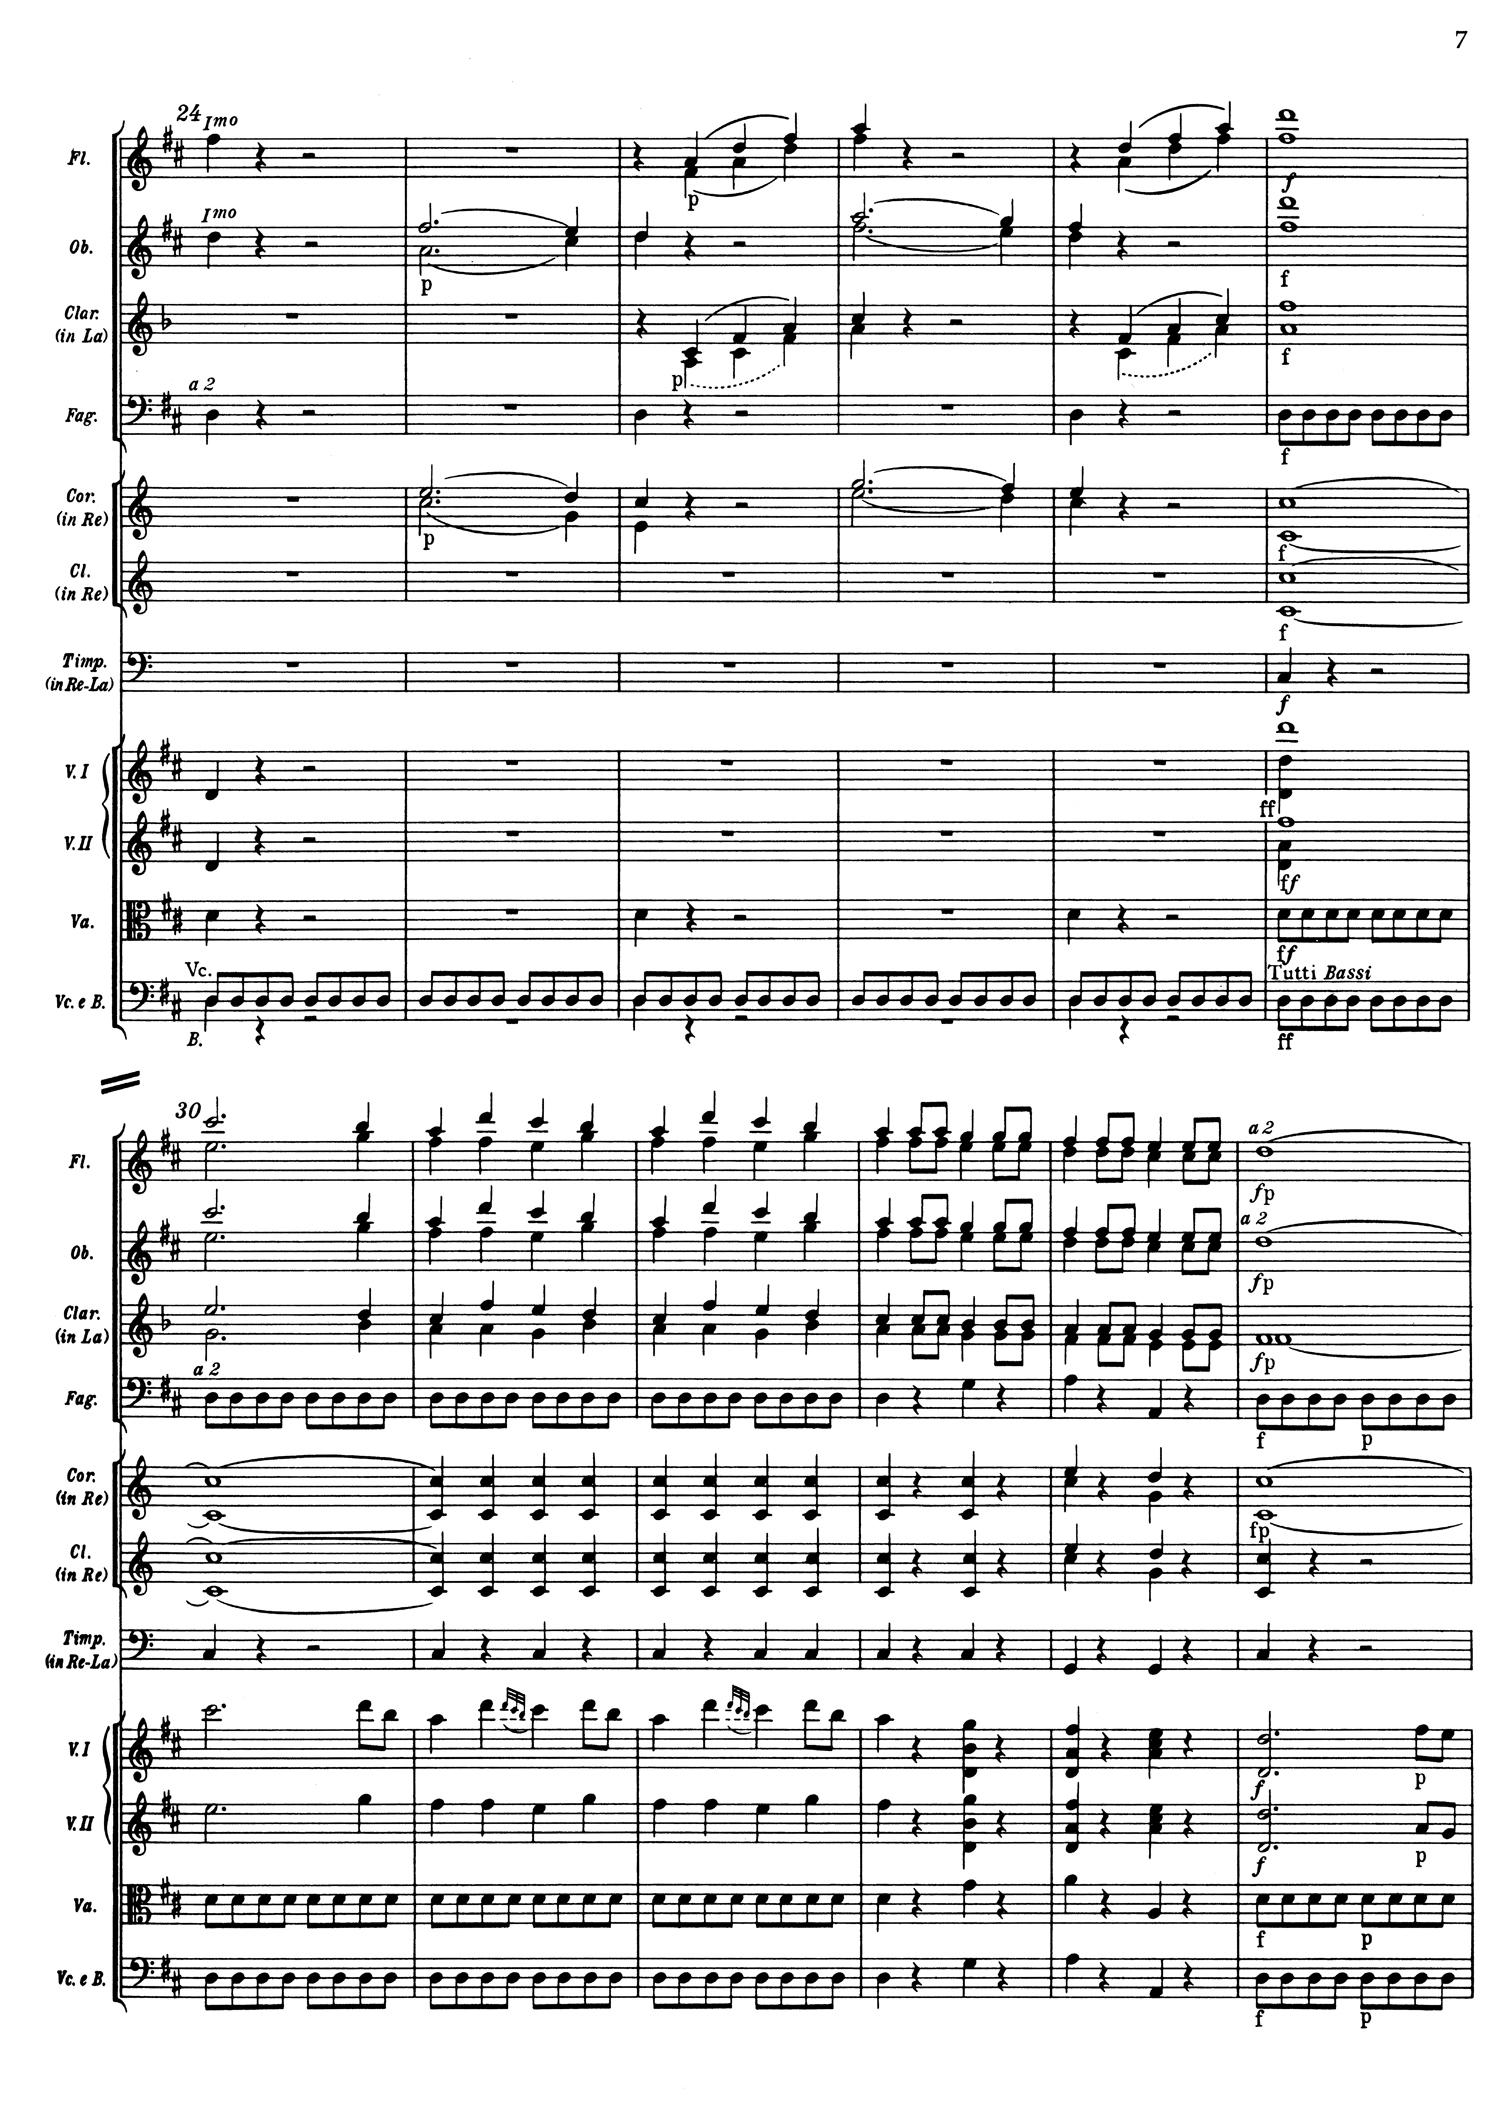 Mozart Figaro Score 3.jpg